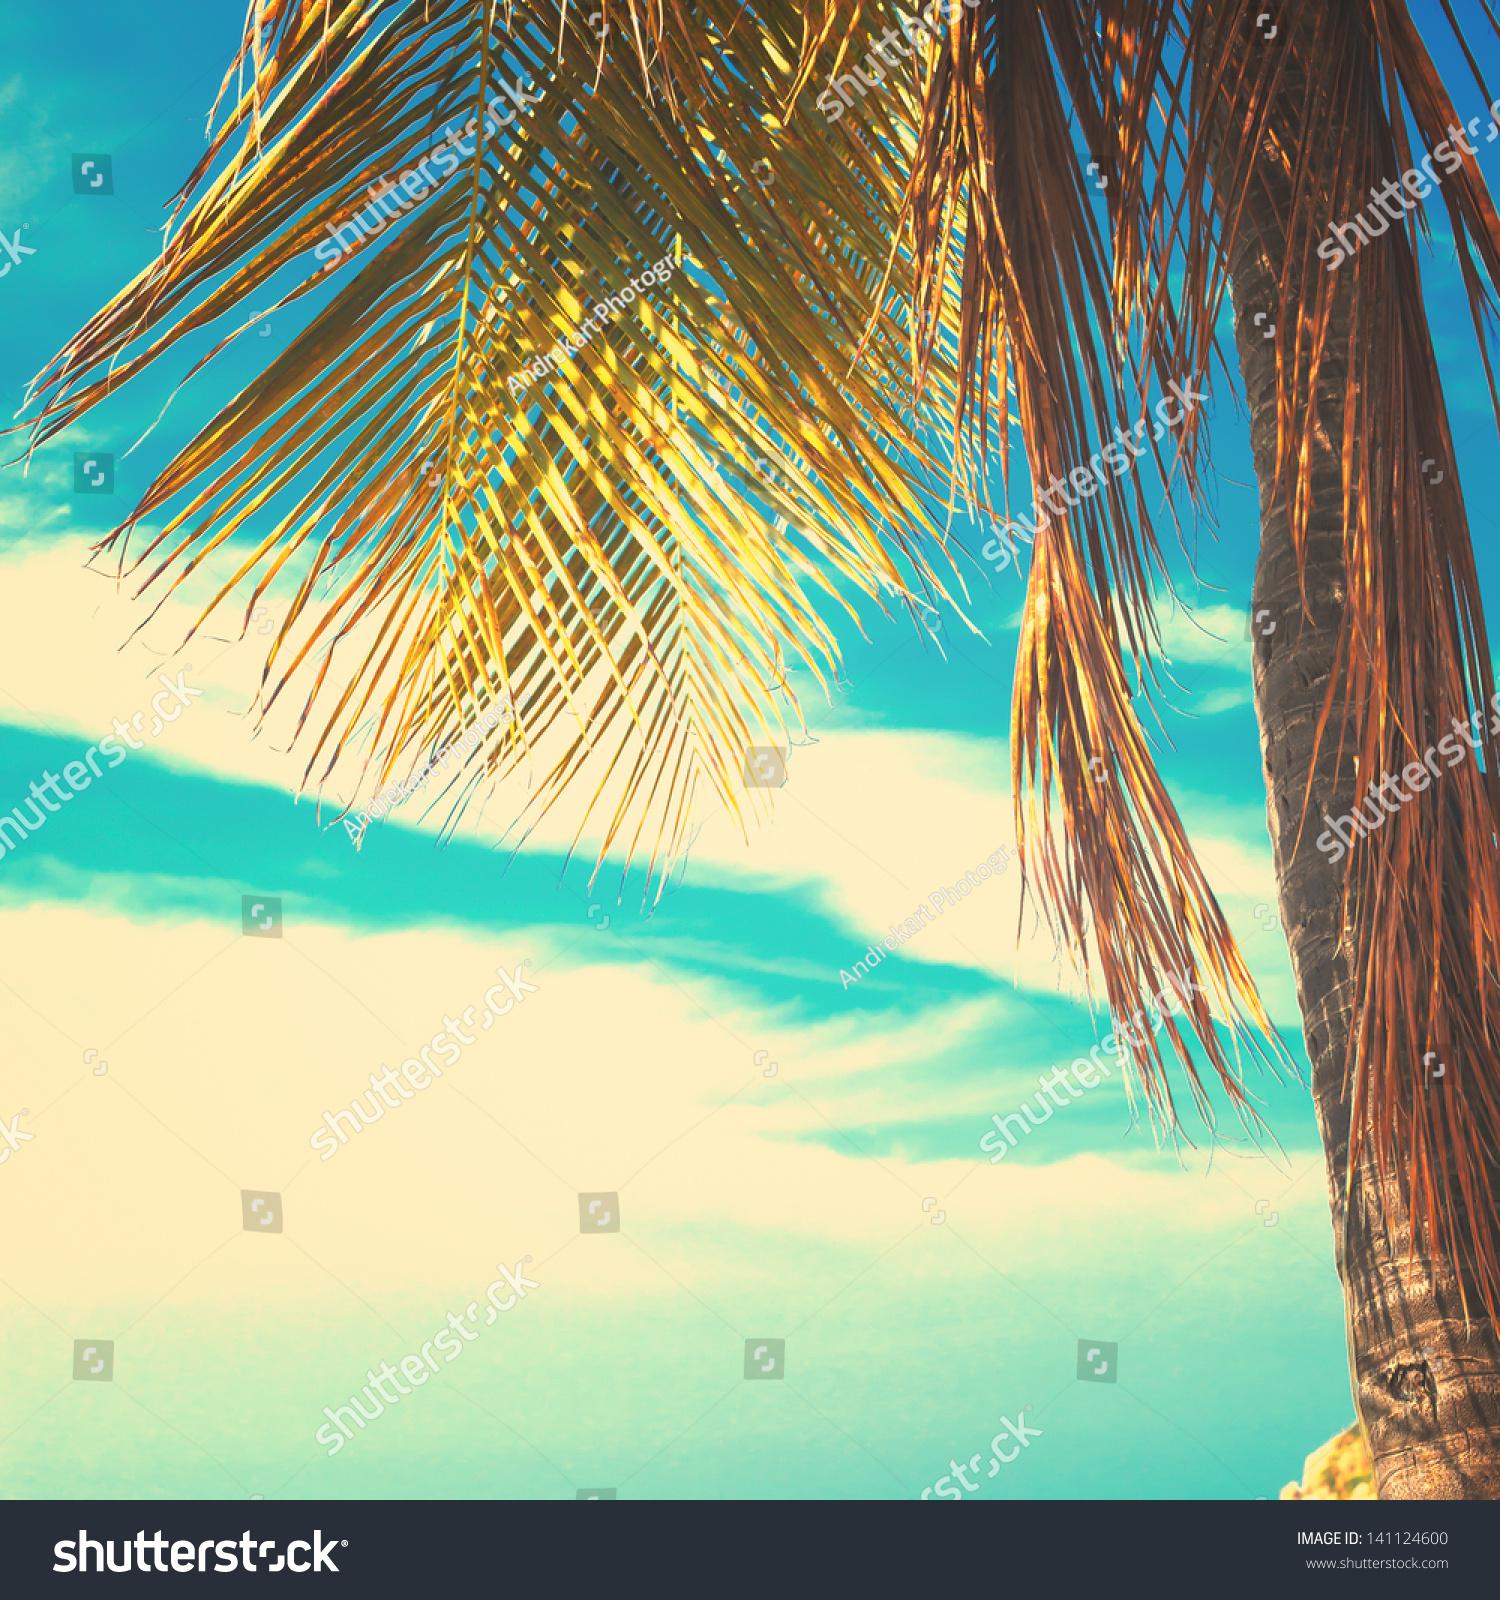 Retro Beach Stock Photo 141124600